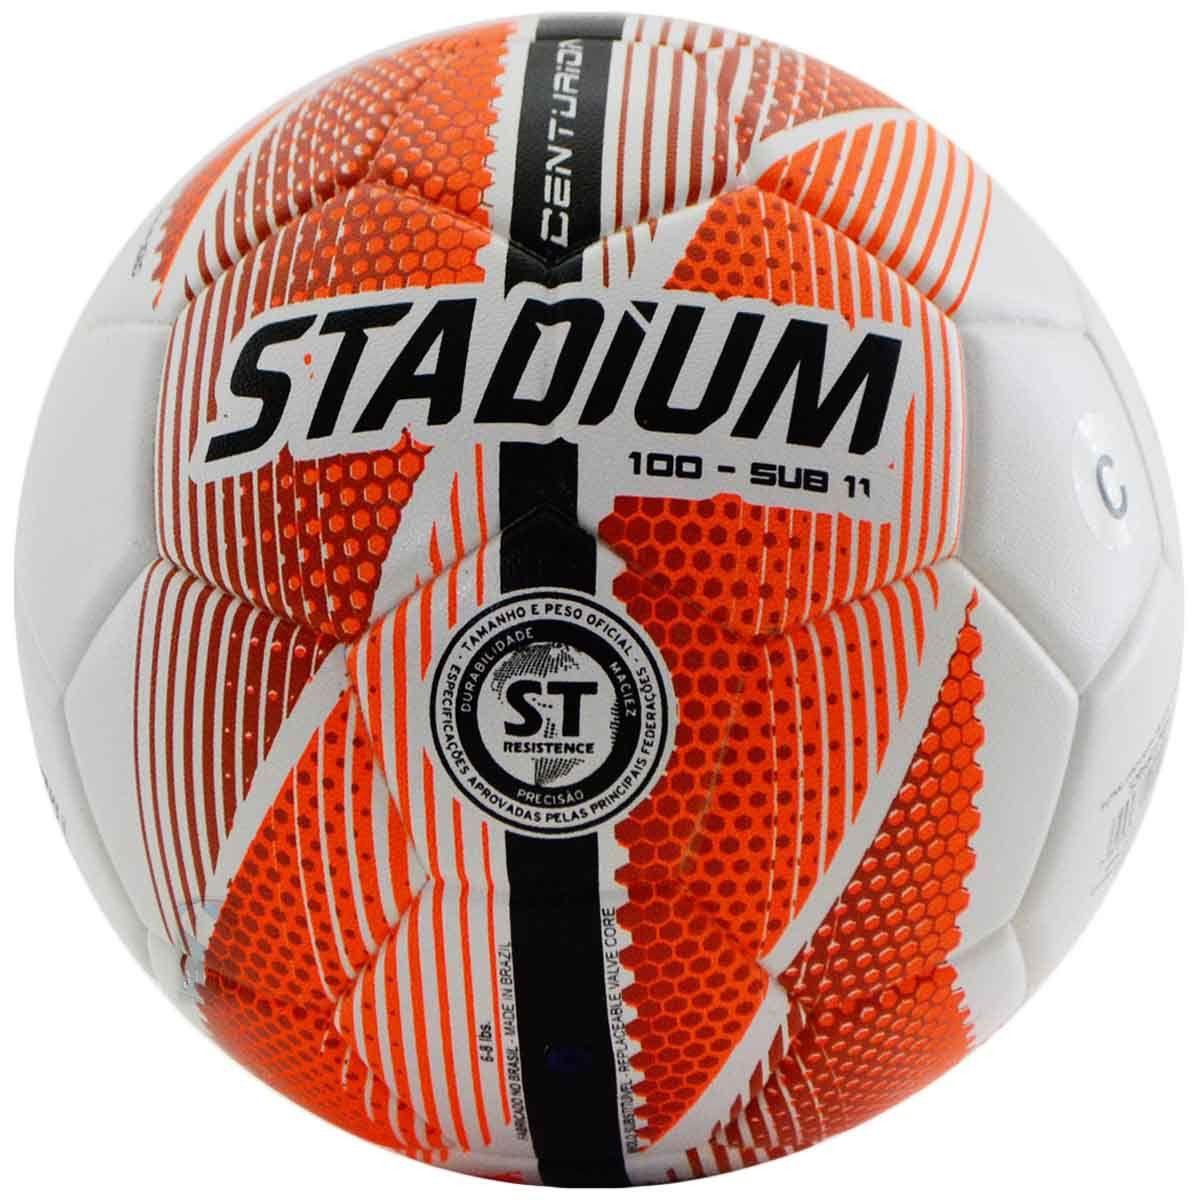 Bola Futsal Infantil Centurion 100 Sub 11 Termotec - Stadium